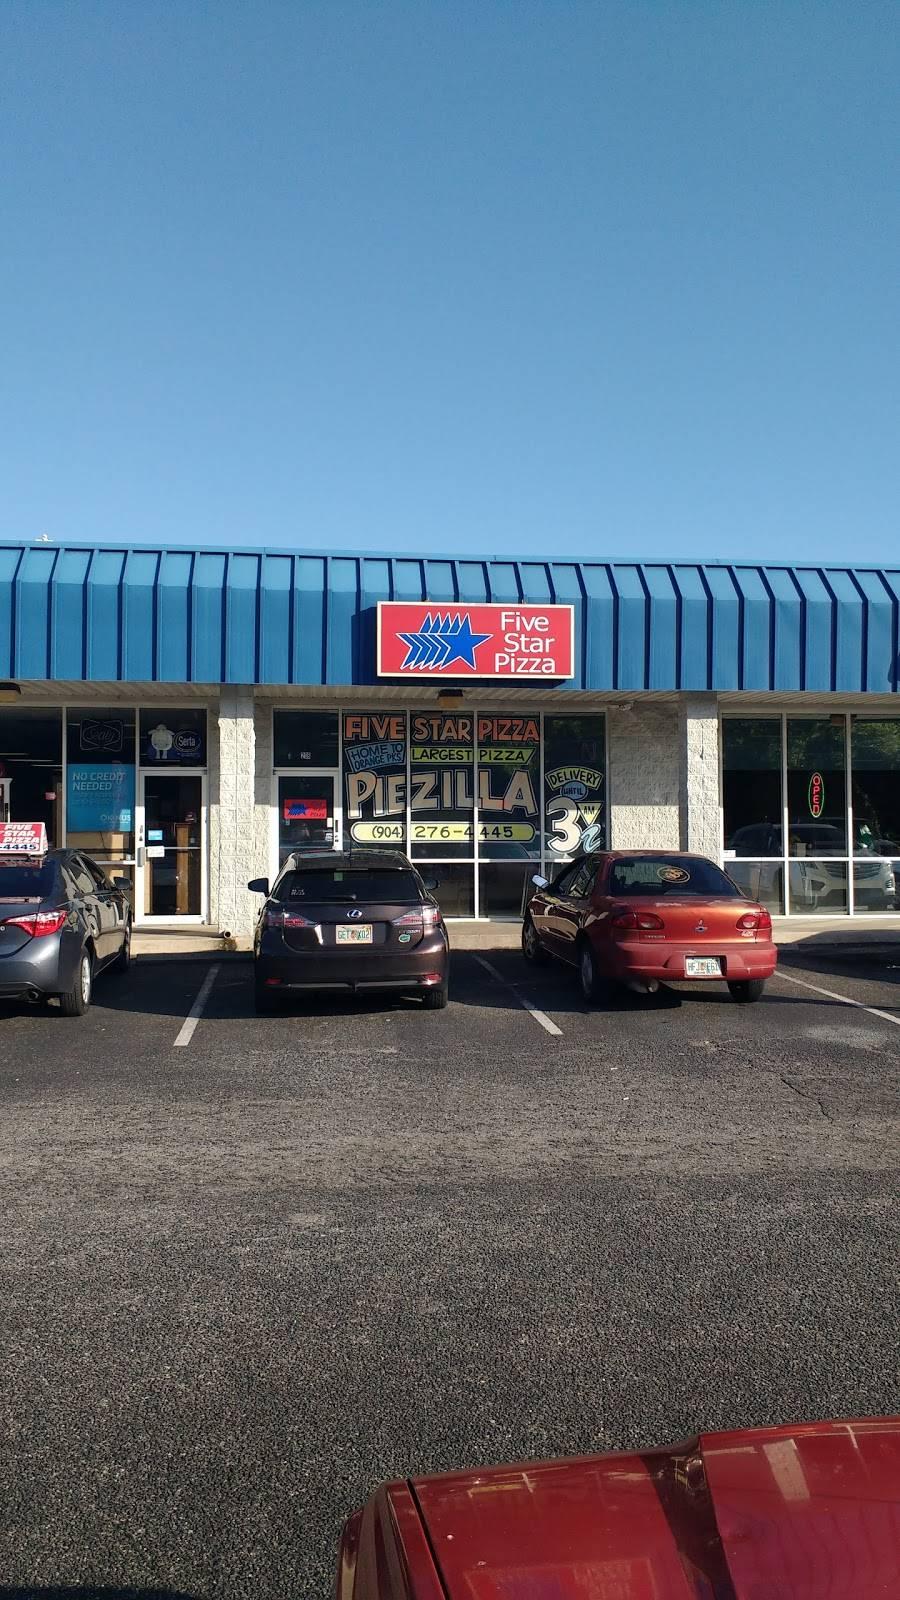 Five Star Pizza   restaurant   1045 Blanding Blvd, Orange Park, FL 32065, USA   9042764445 OR +1 904-276-4445